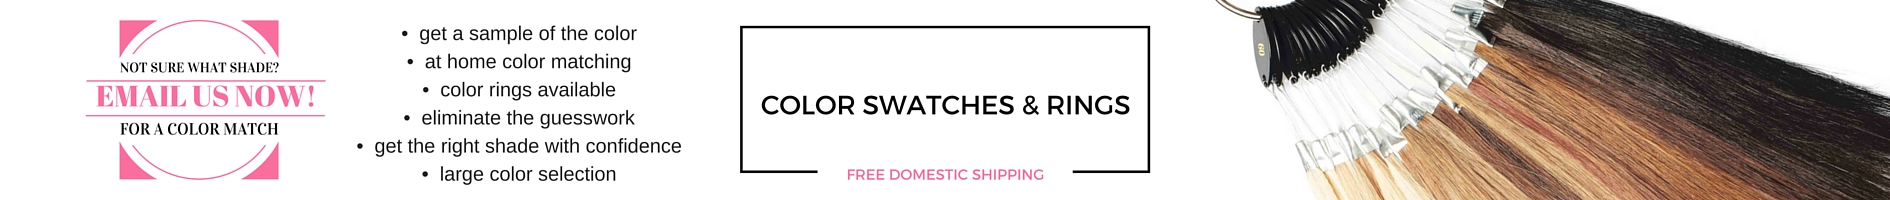 swatch-banner.jpg